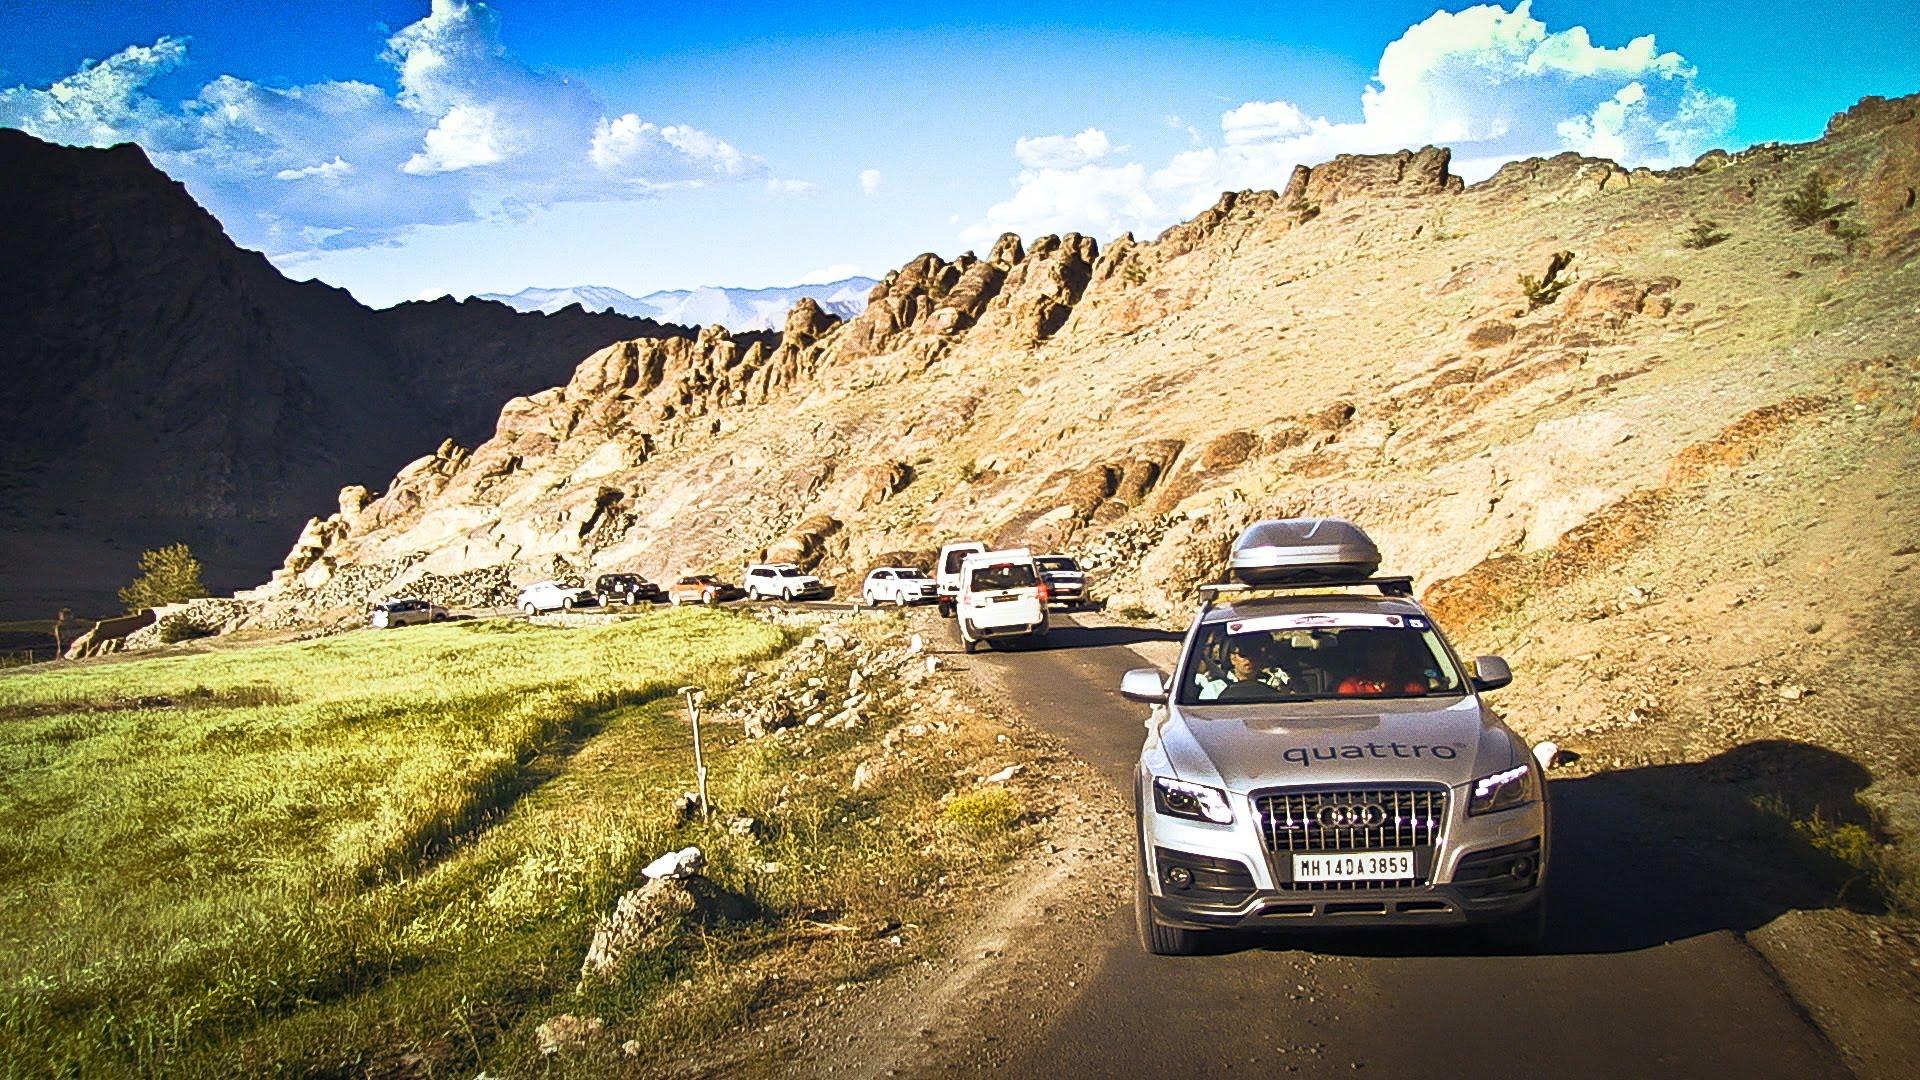 Enjoy Your Tour Via Ladakh Packages from Mumbai